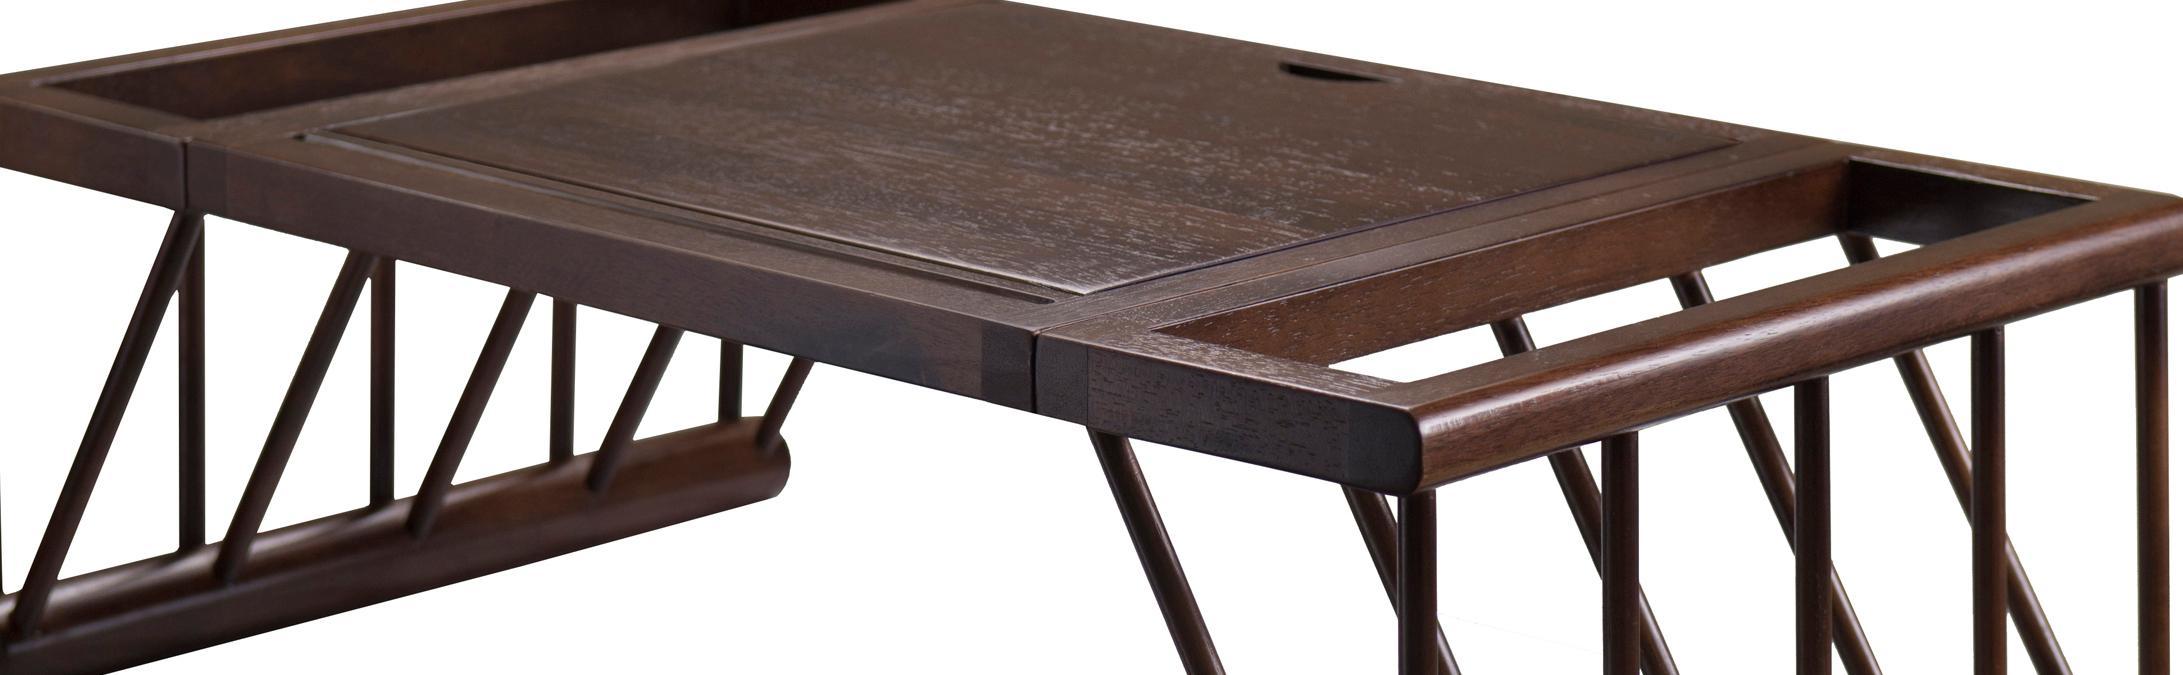 Winsome Cambridge Lap And Bed Desk 1829 0 Lapson Mexico